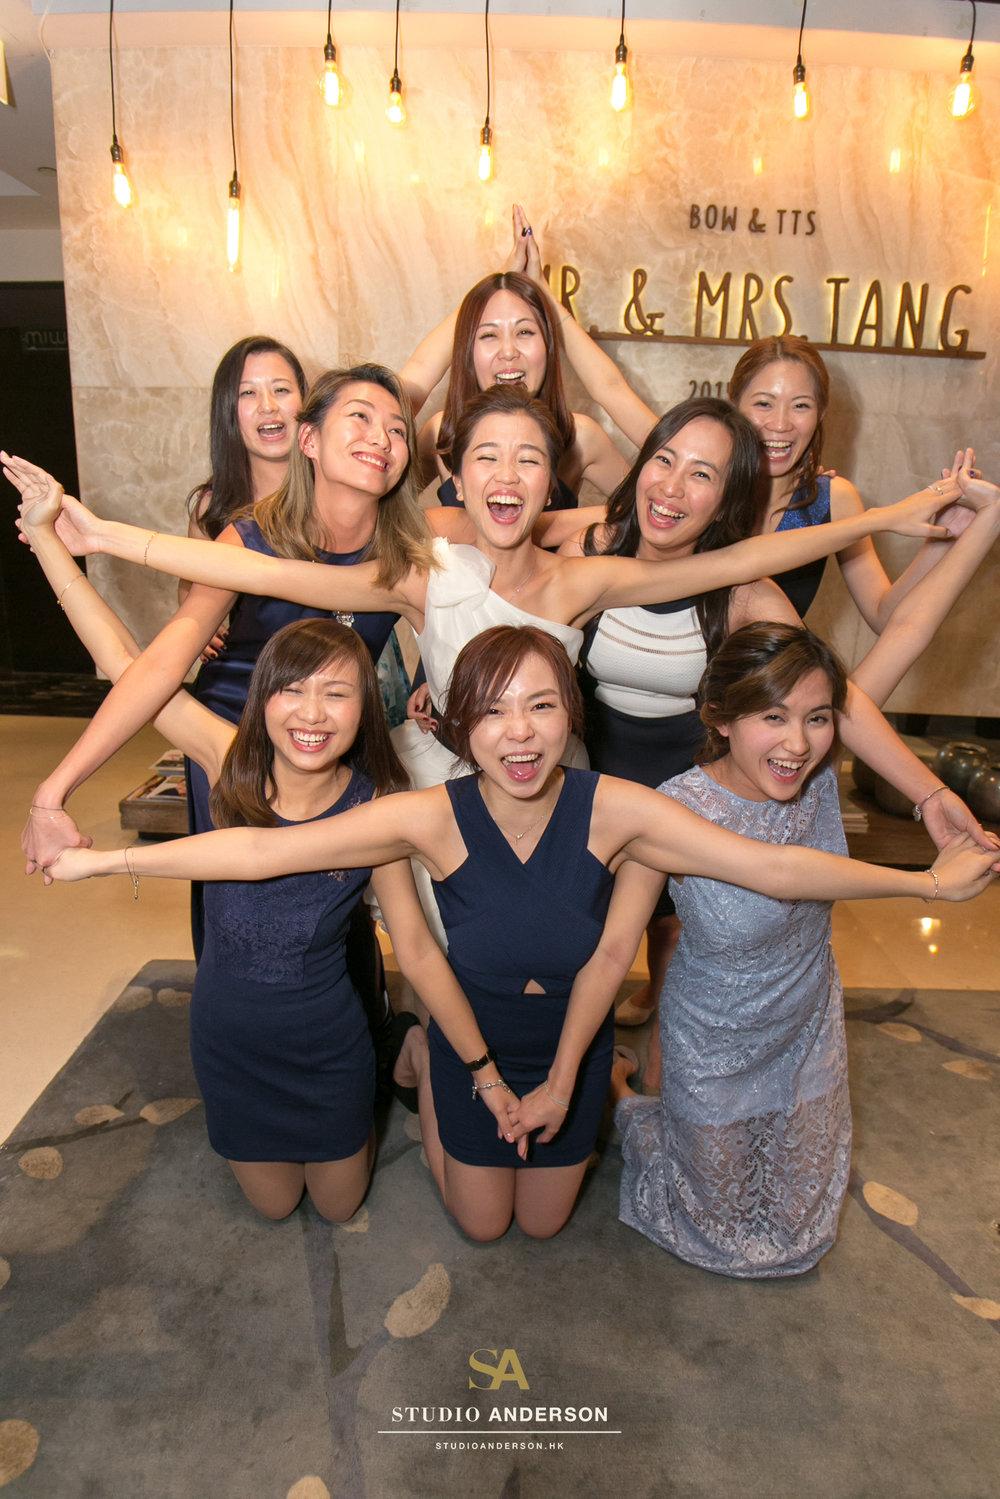 Funny bride and bridesmaids also!!